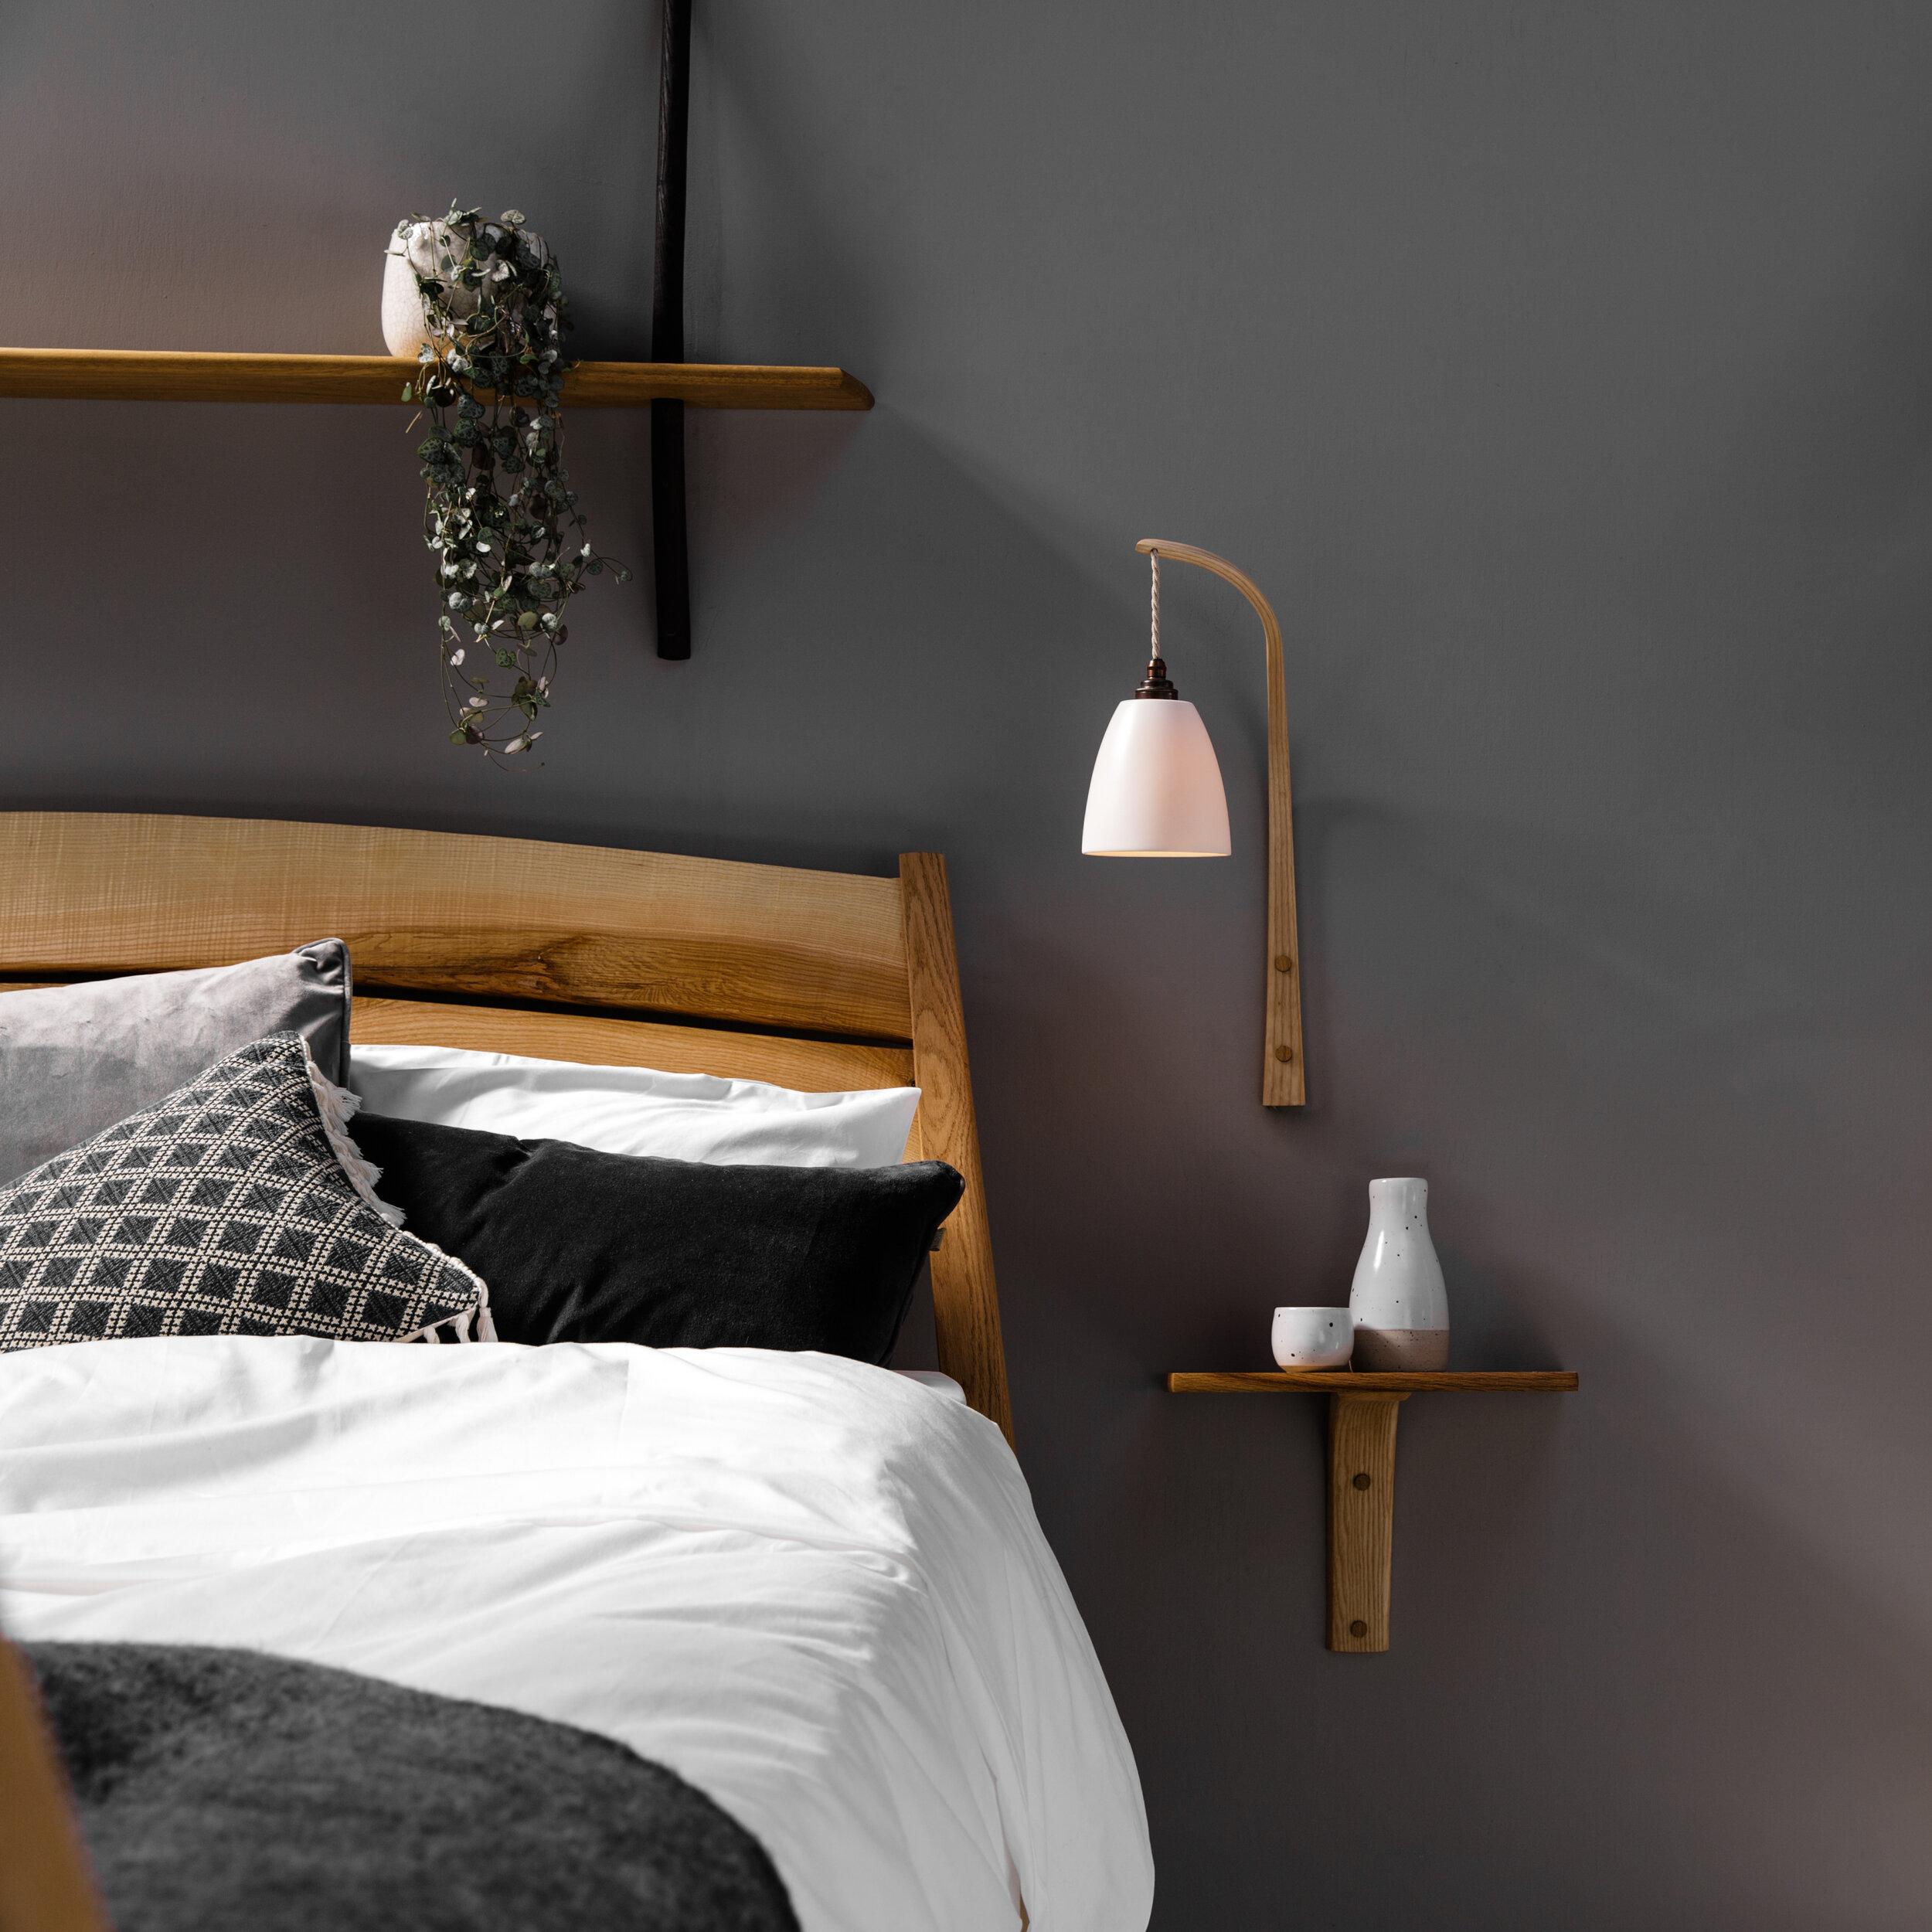 Lomas Aug 2019 bed websize-6.jpg